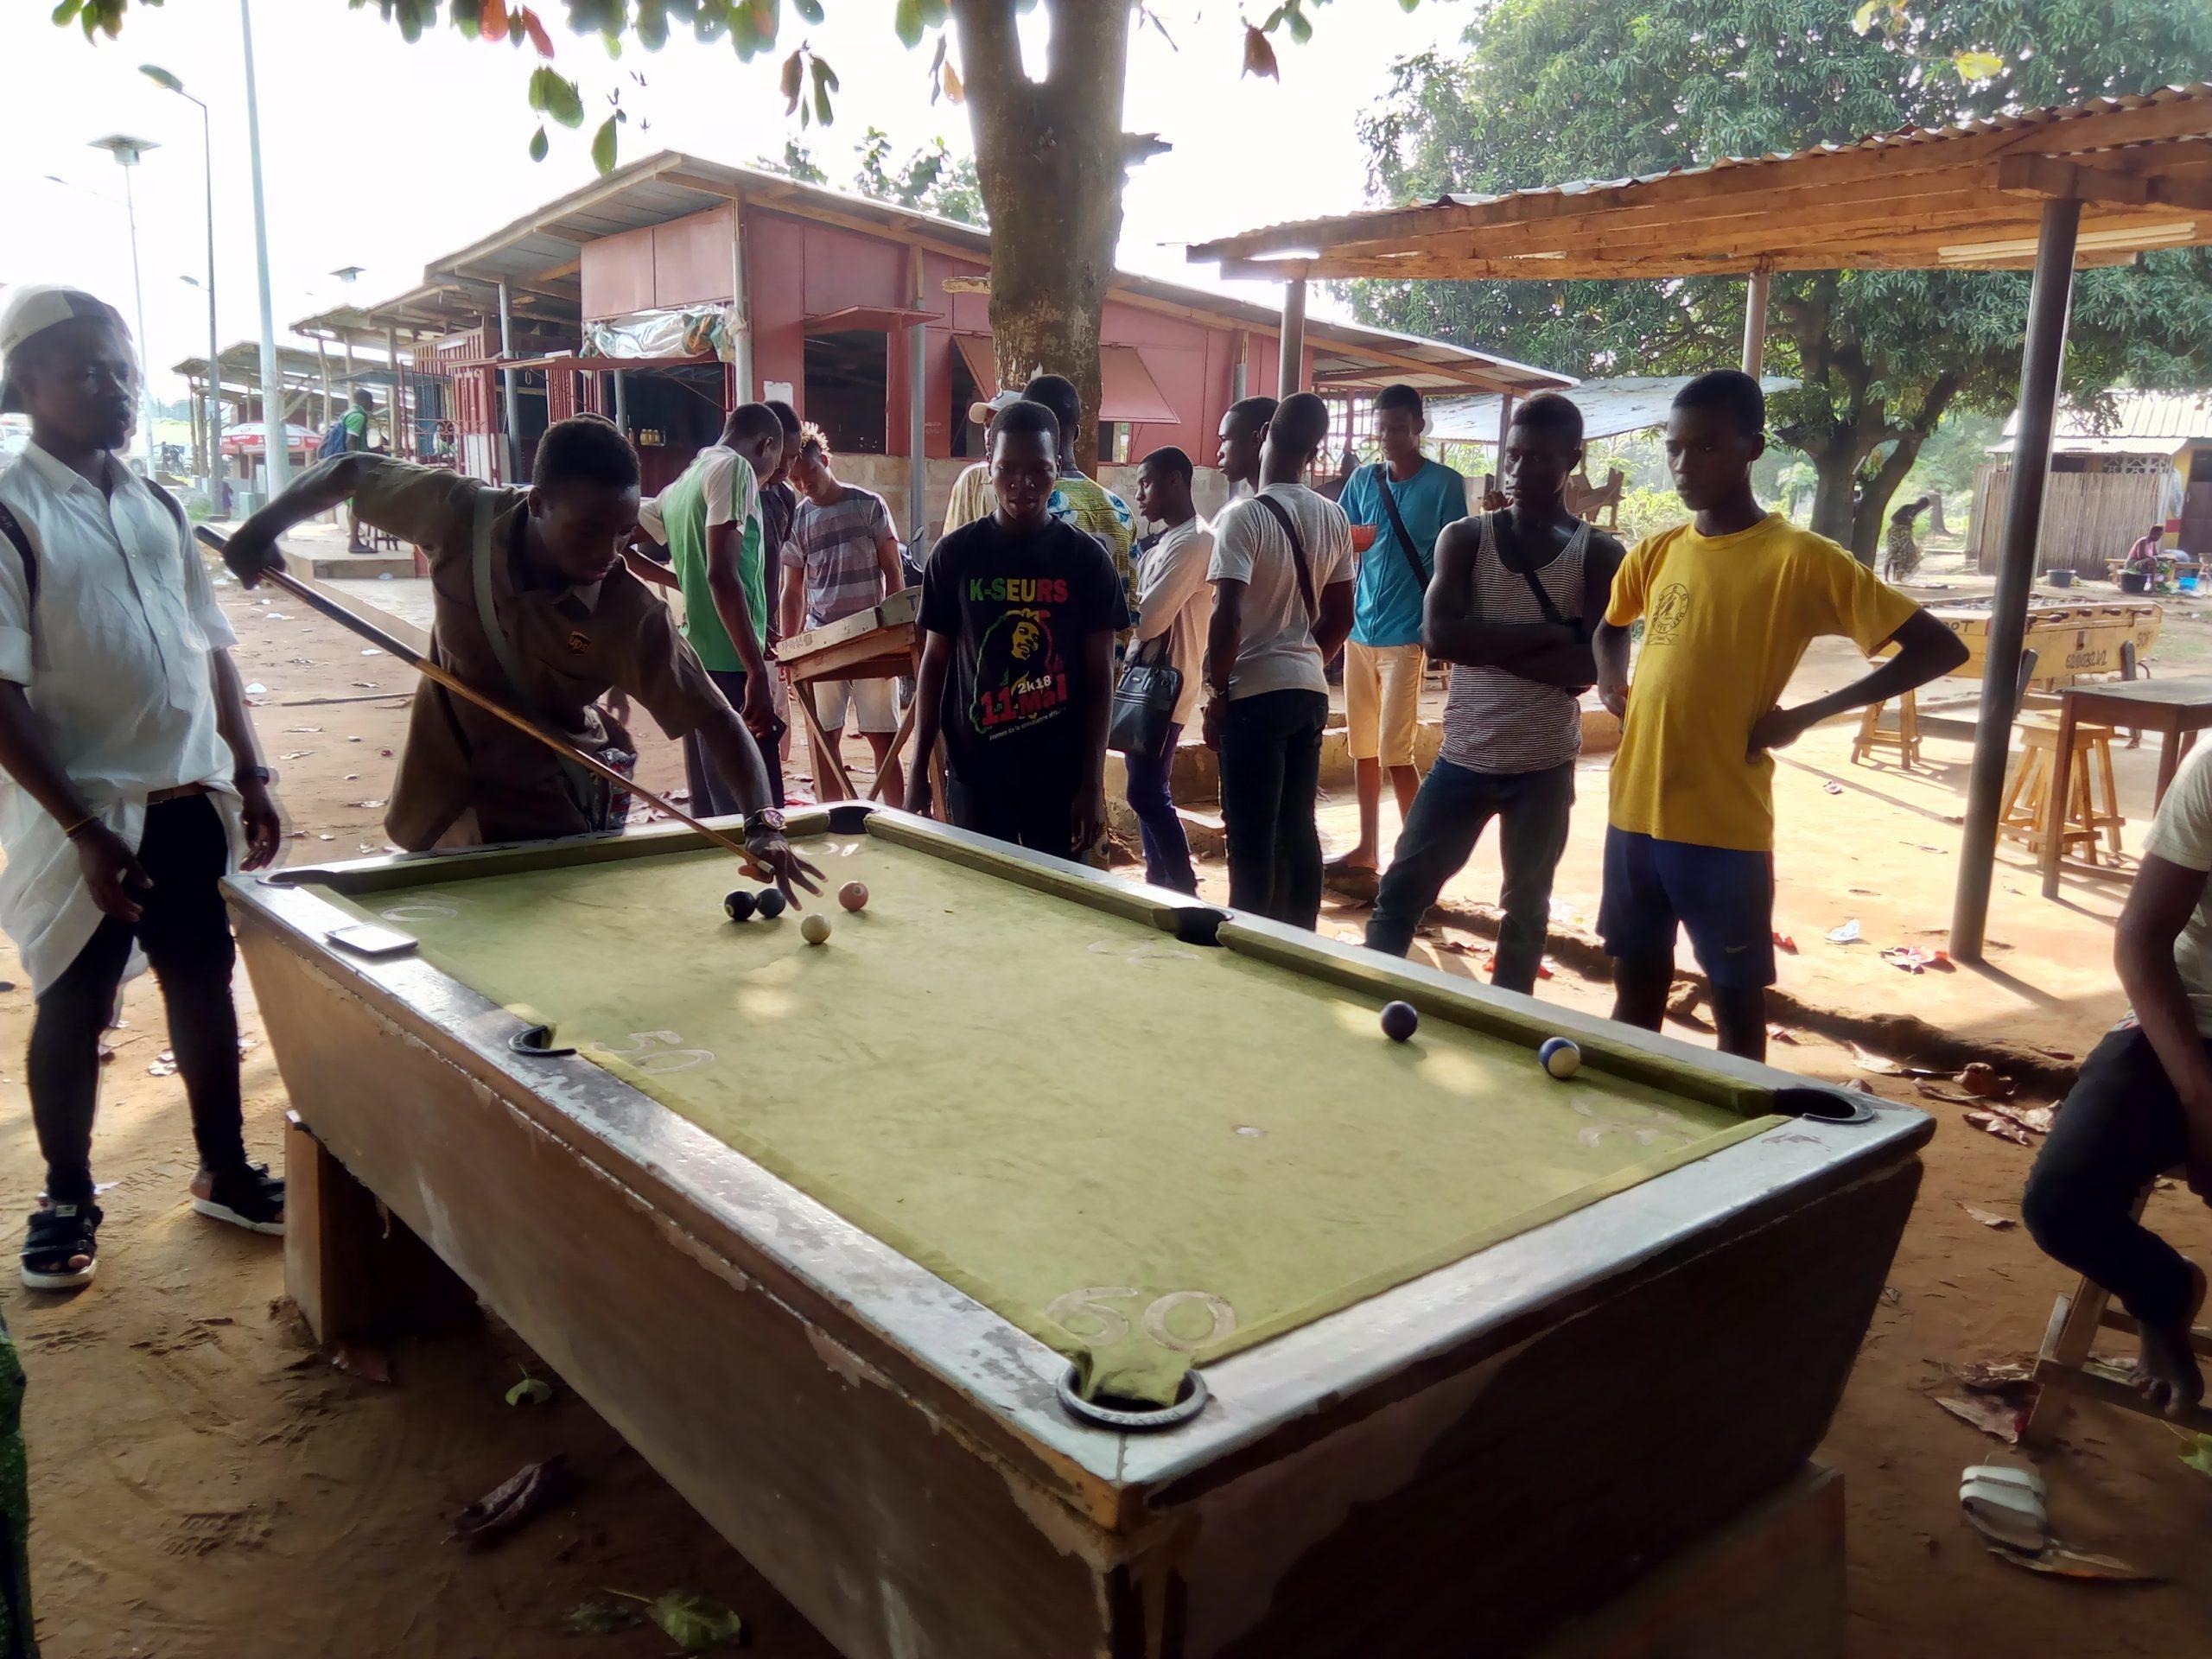 File:jeux De Billard À L'université Du Benin - Wikimedia serapportantà Jeux De Biyare